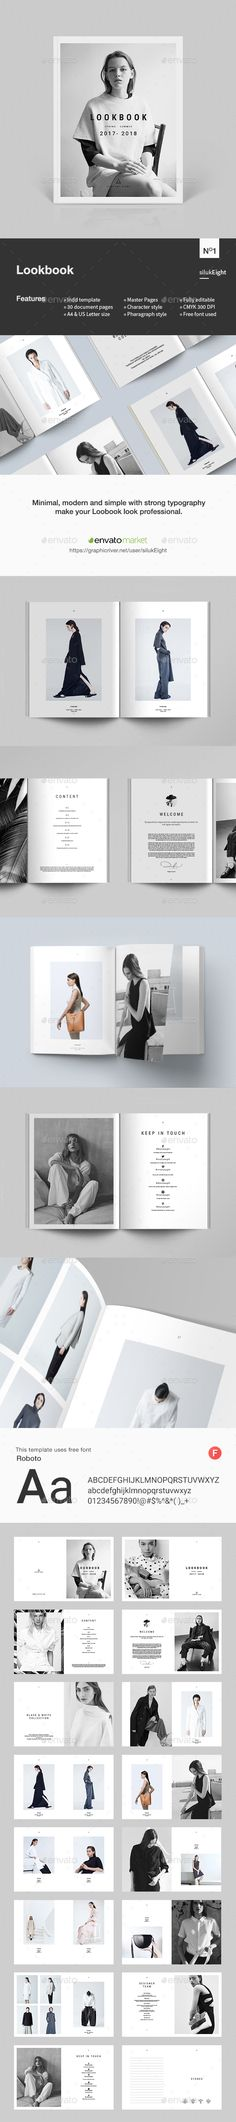 Lookbook — InDesign INDD #portfolio #clothing • Download ➝ https://graphicriver.net/item/lookbook/19527313?ref=pxcr